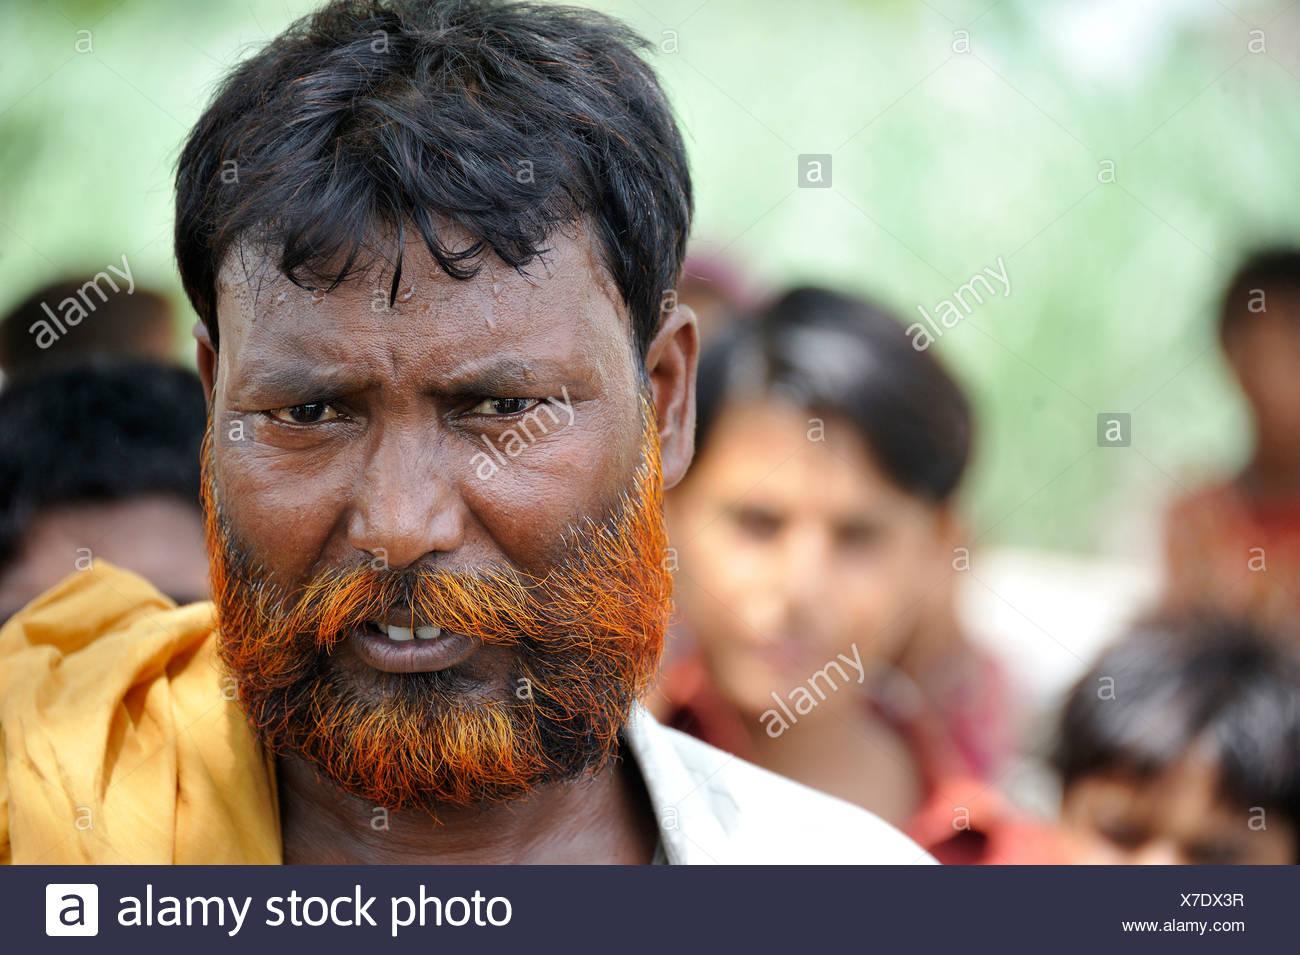 Man With A Henna Dyed Beard Portrait Muzaffaragarh Punjab